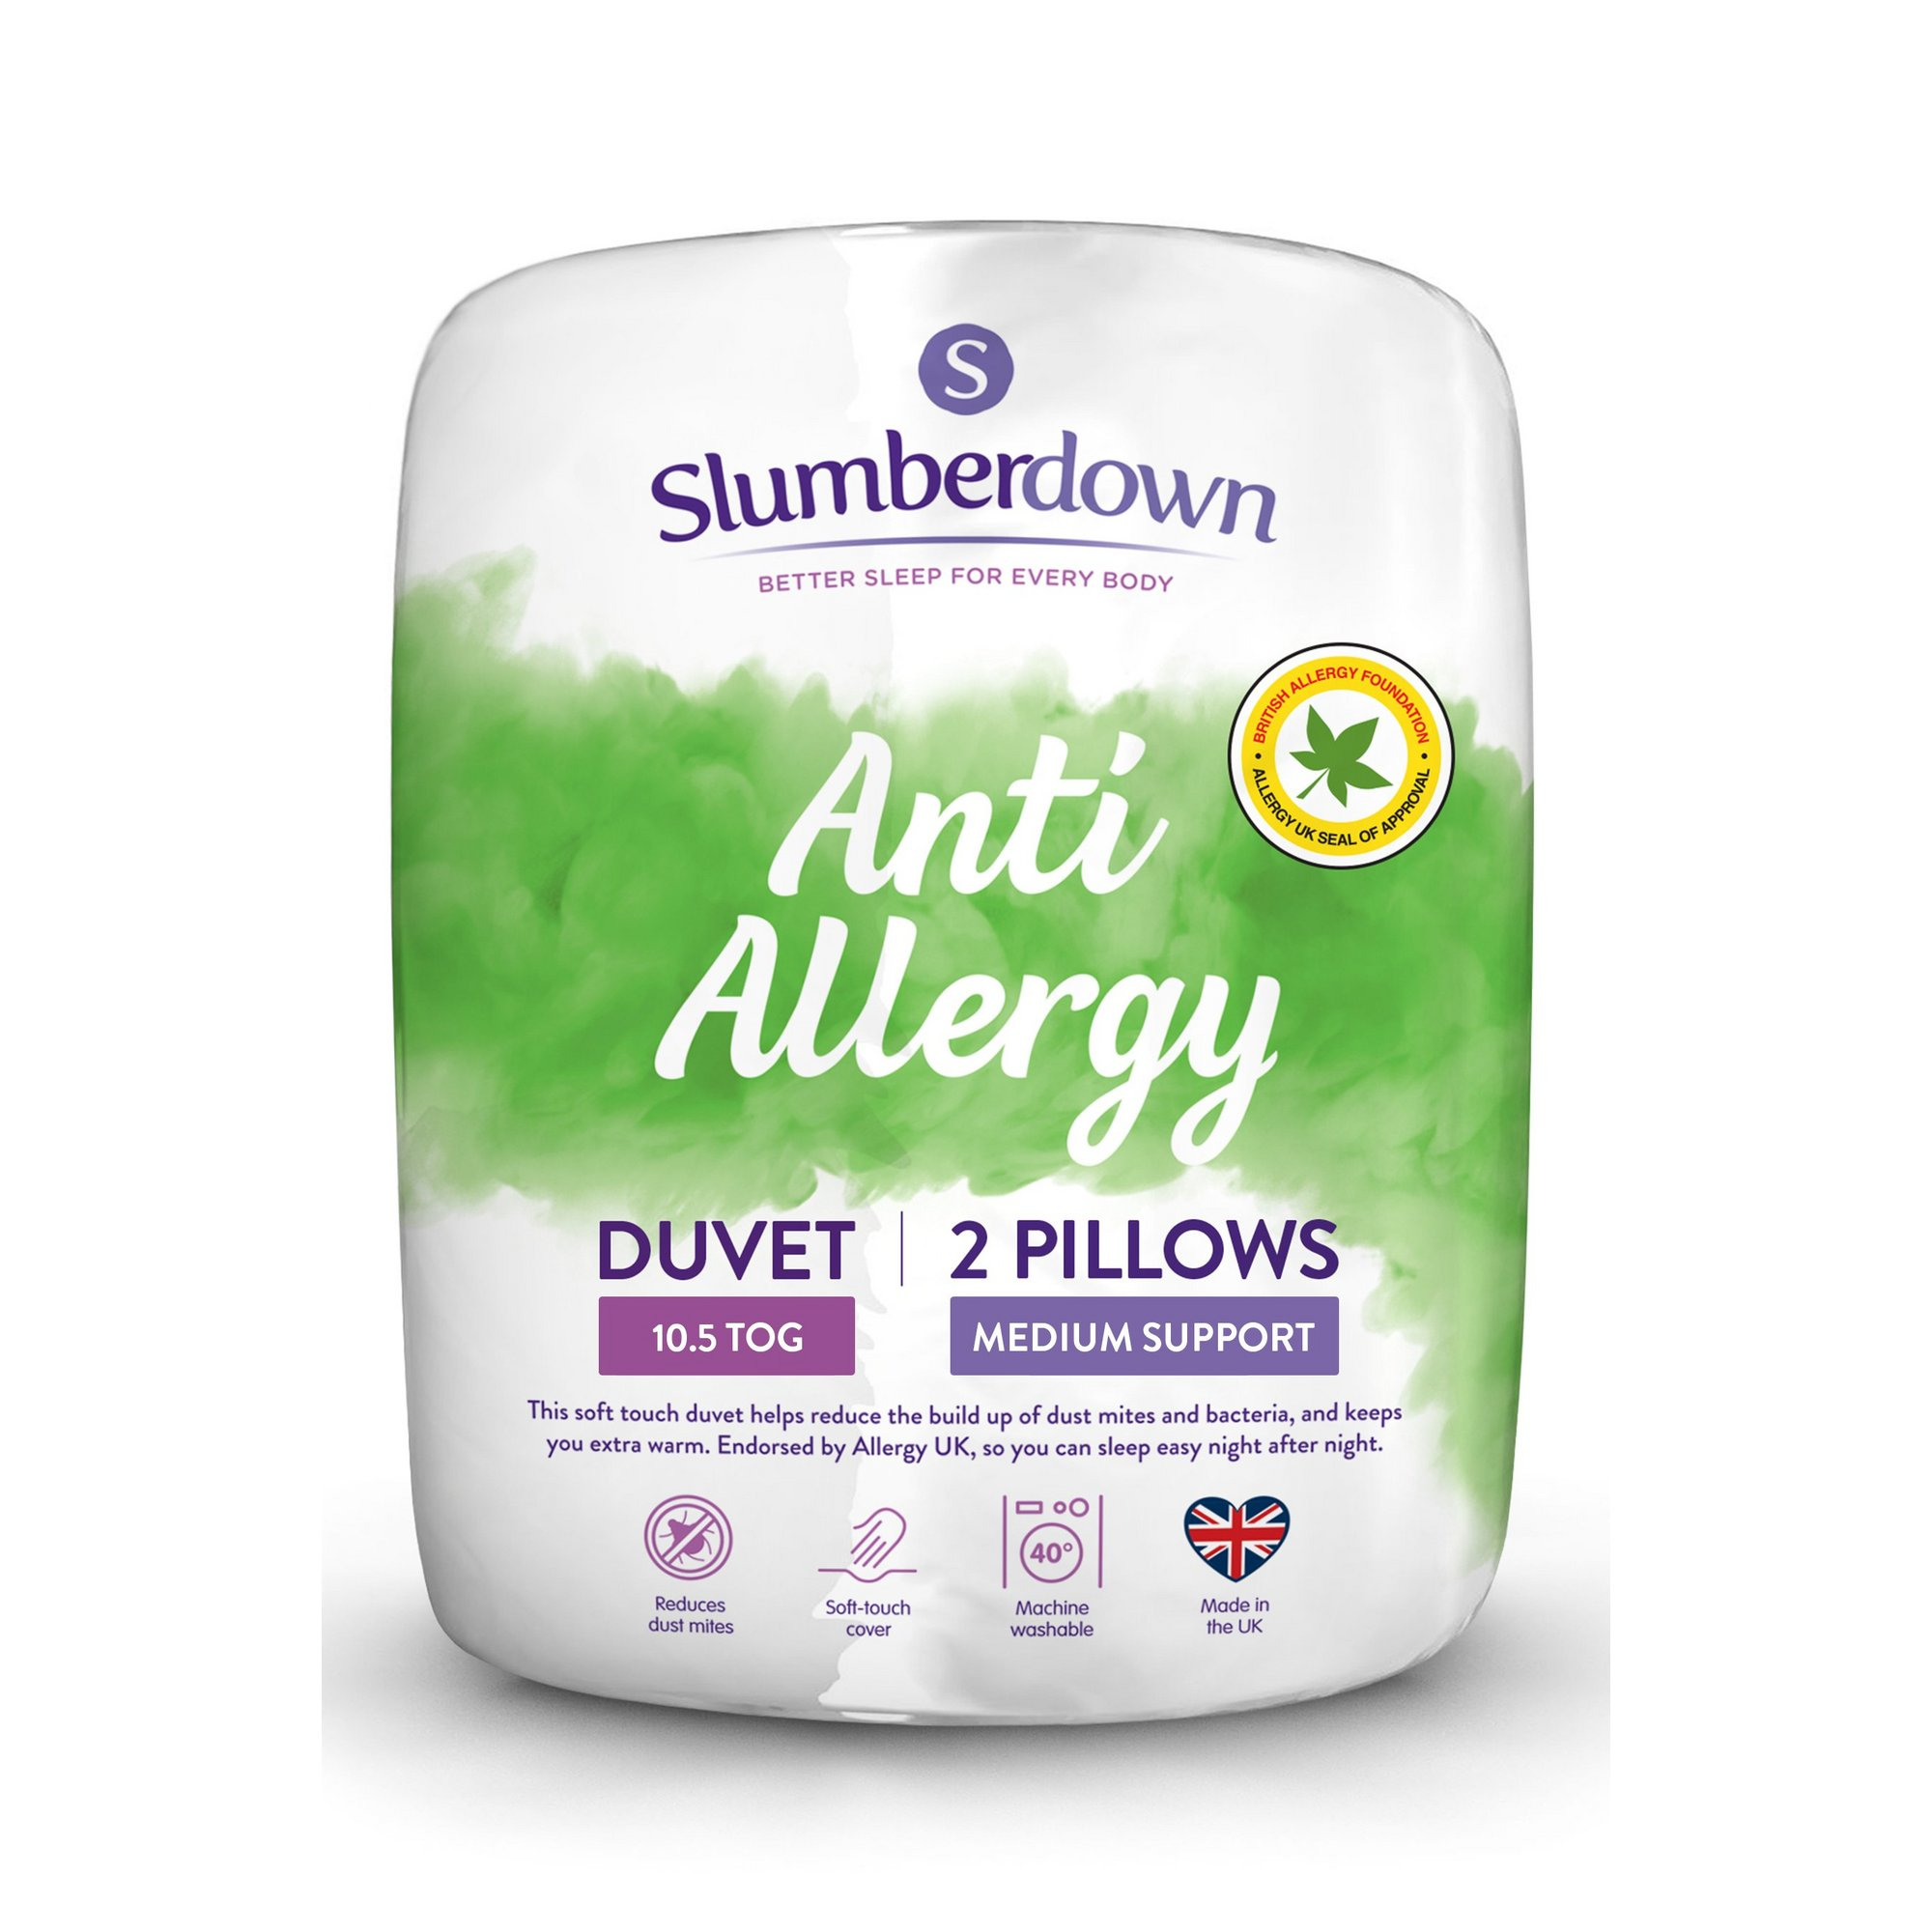 Image of Slumberdown Anti Allergy 10.5 Tog Duvet and 2 Pillows